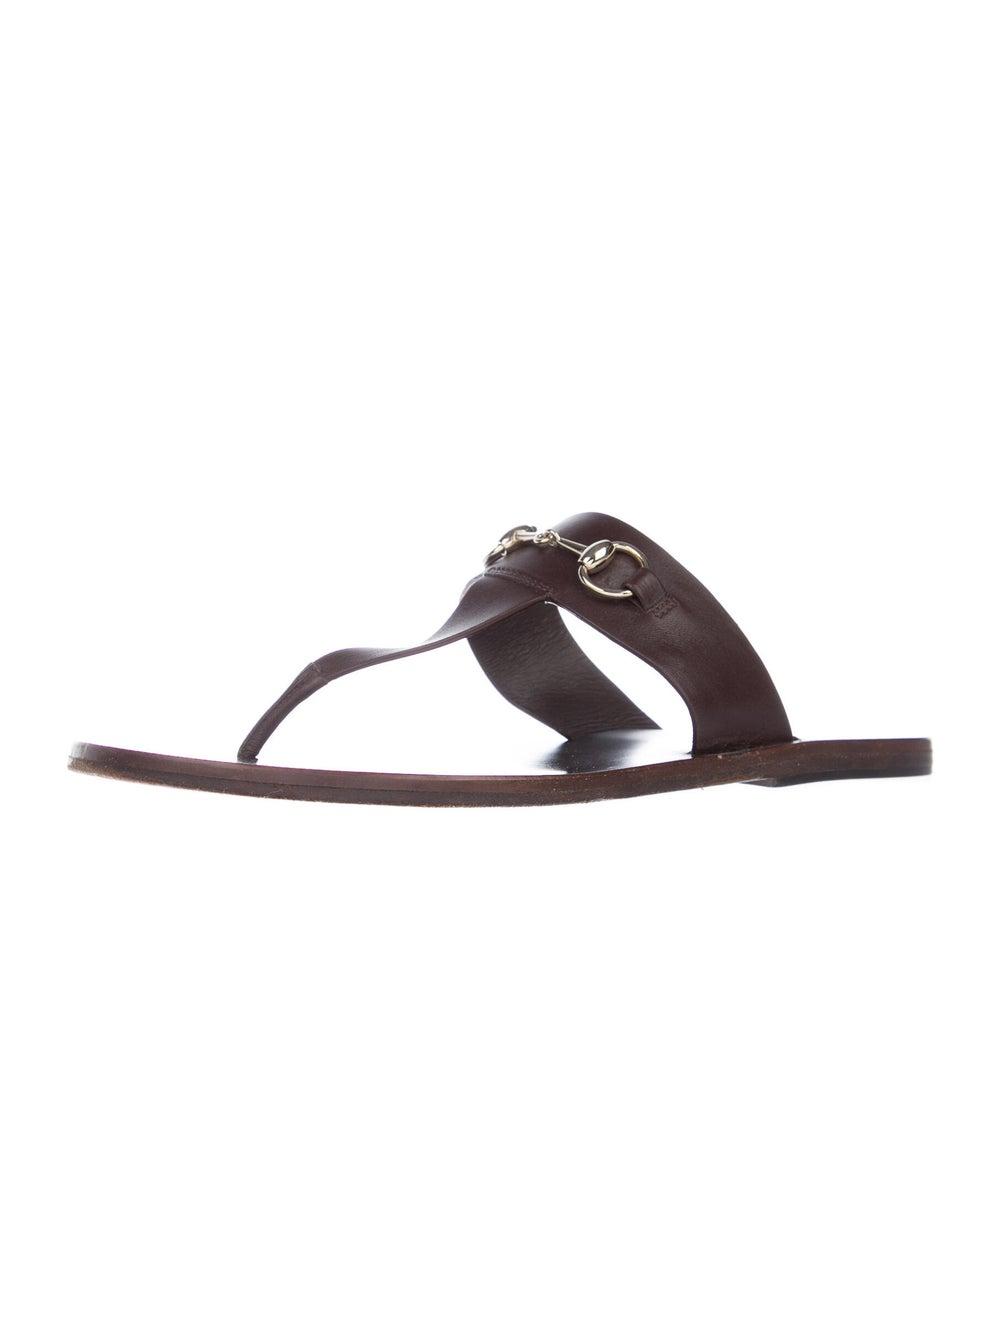 Gucci Horsebit Accent Leather Slides Brown - image 2